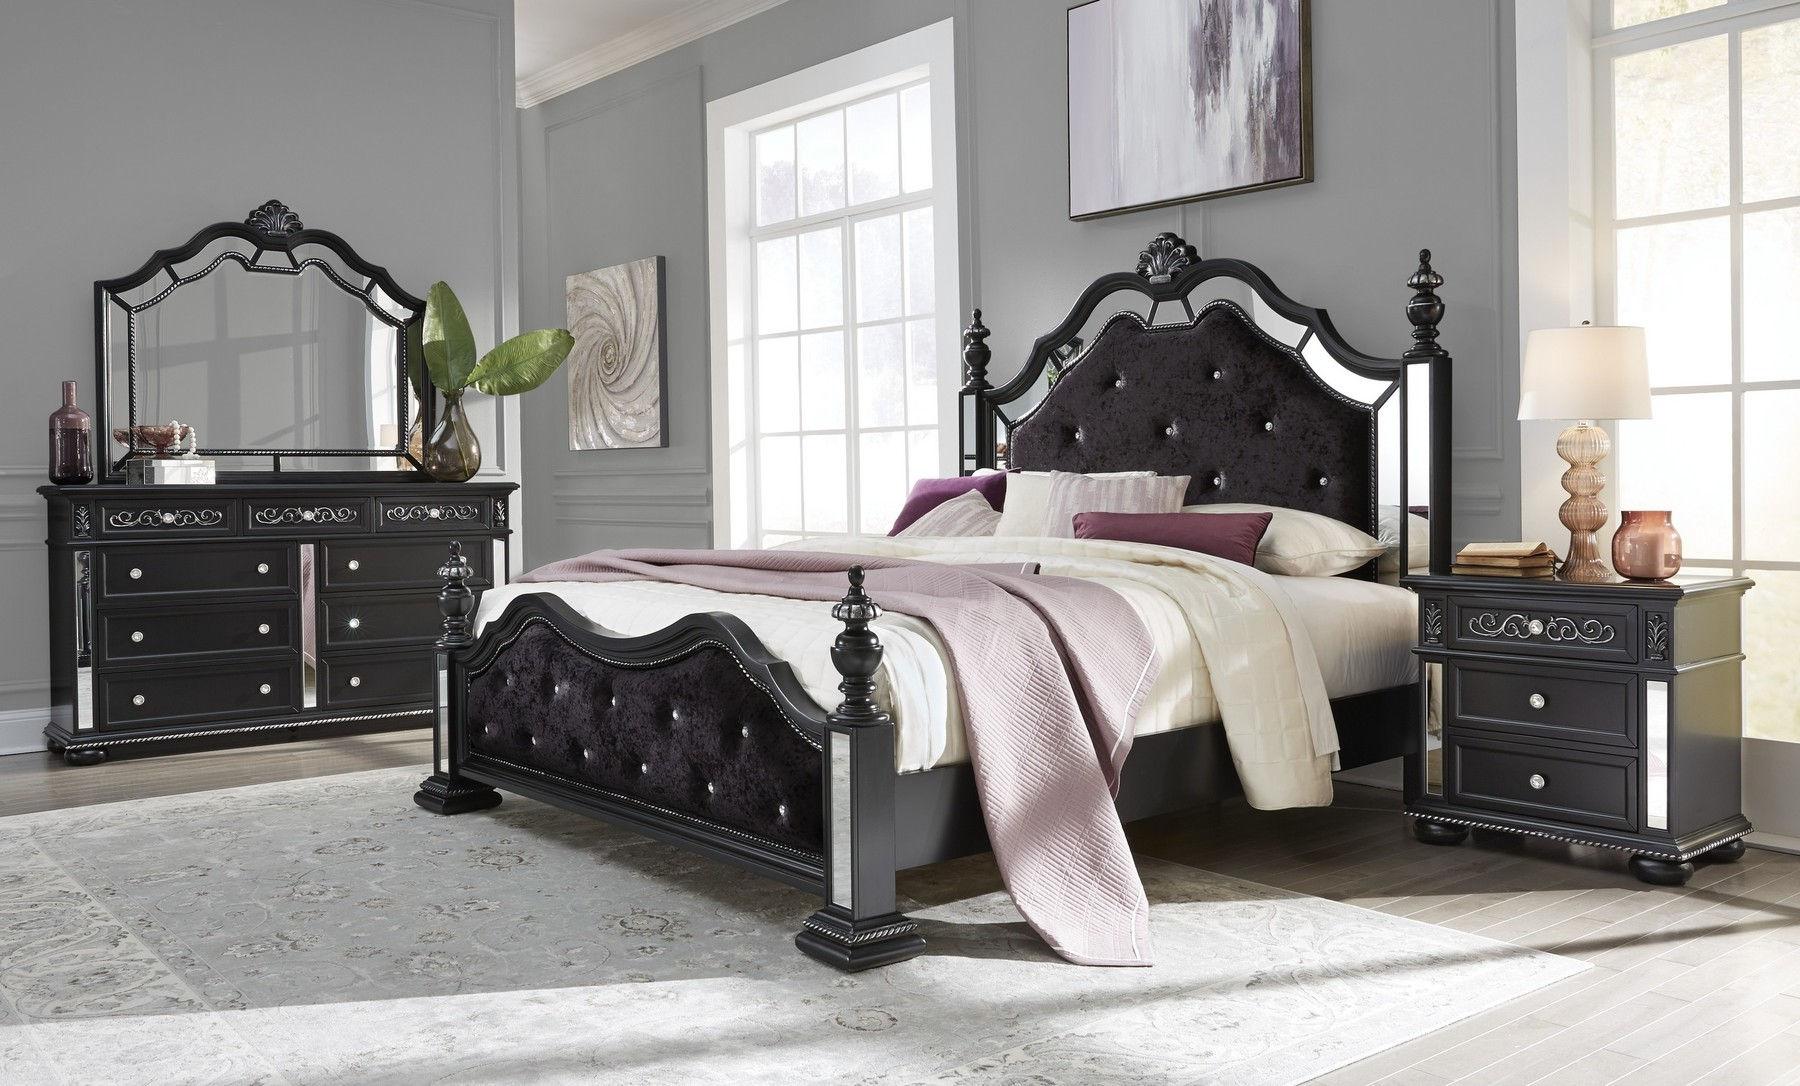 Diana Black King Size Bed Diana Global Furniture Usa King Size Beds Comfyco Furniture